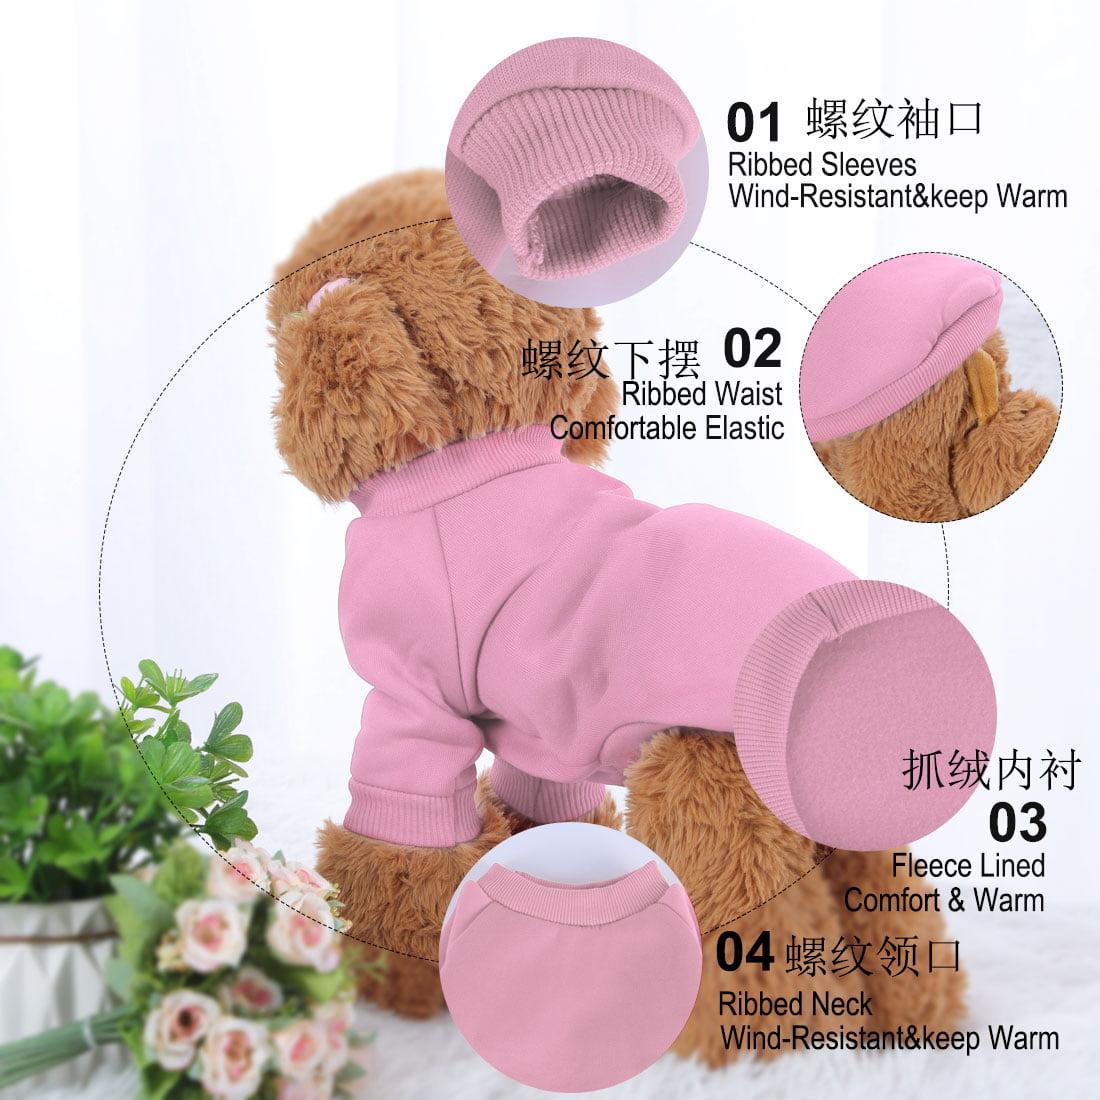 Cotton Blend Dog Winter Sweatshirt Pet Clothes Fleece Lined Warm Coat Pink XL - image 6 of 7